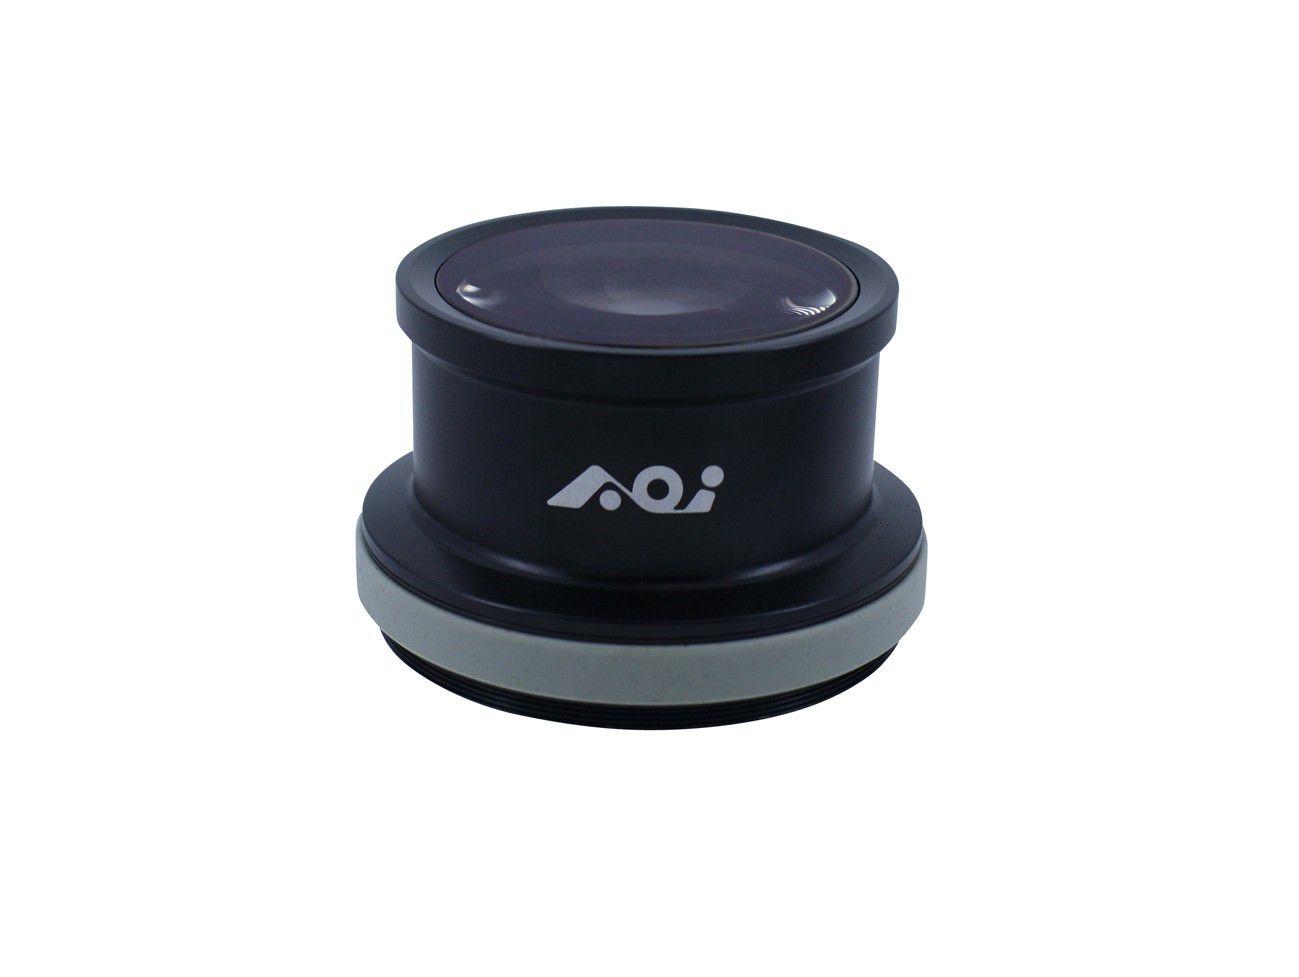 UCL-900 pro Lentille macro +23.5 dioptries en 67mm